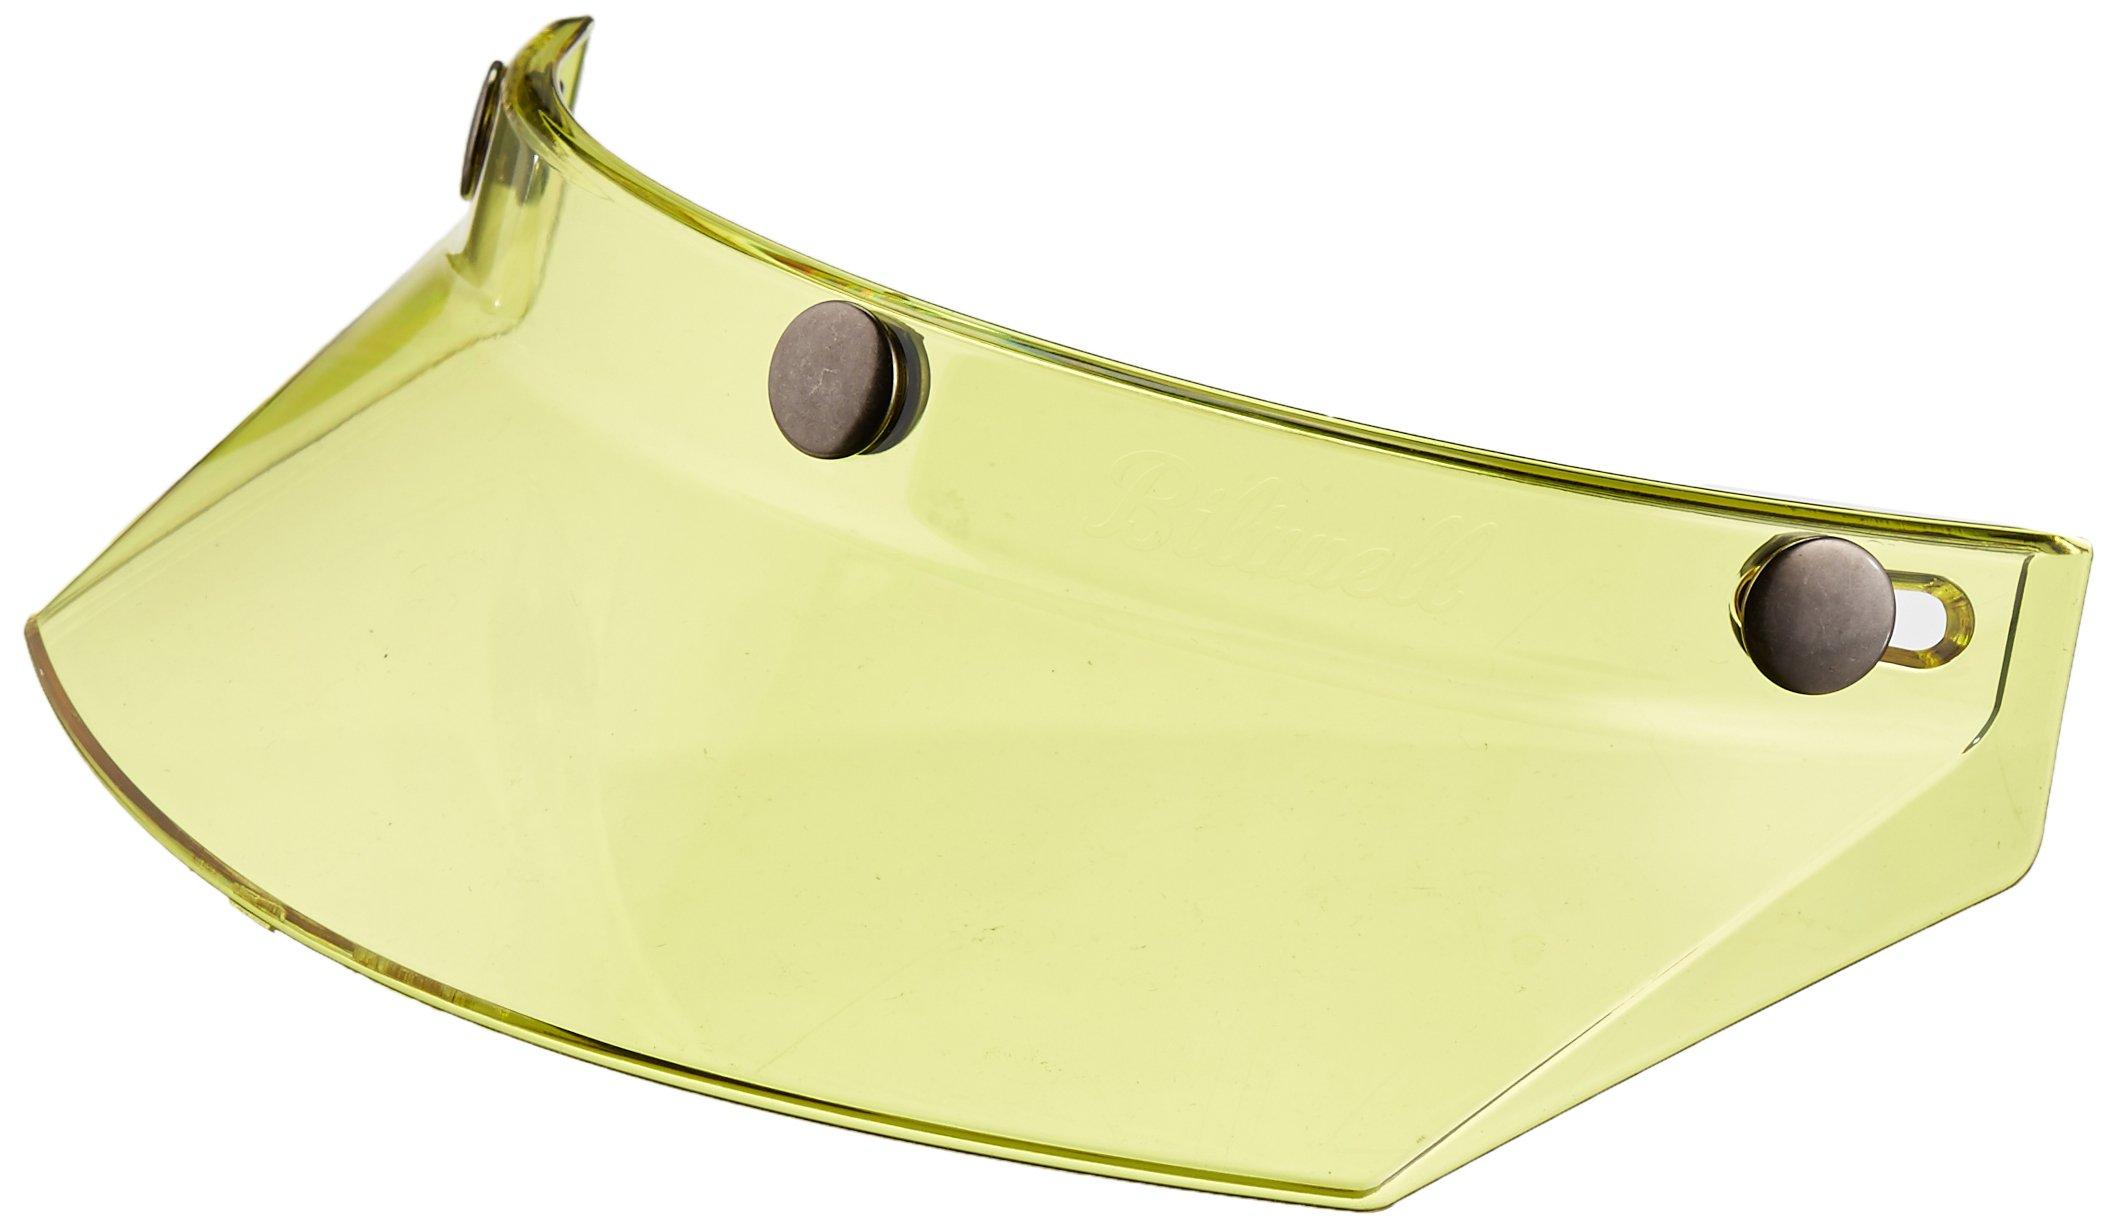 Biltwell MV-YEL-00-TN 3-Snap Moto Visor (Yellow, One Size) (for Most 3-Snap Style Helmets)